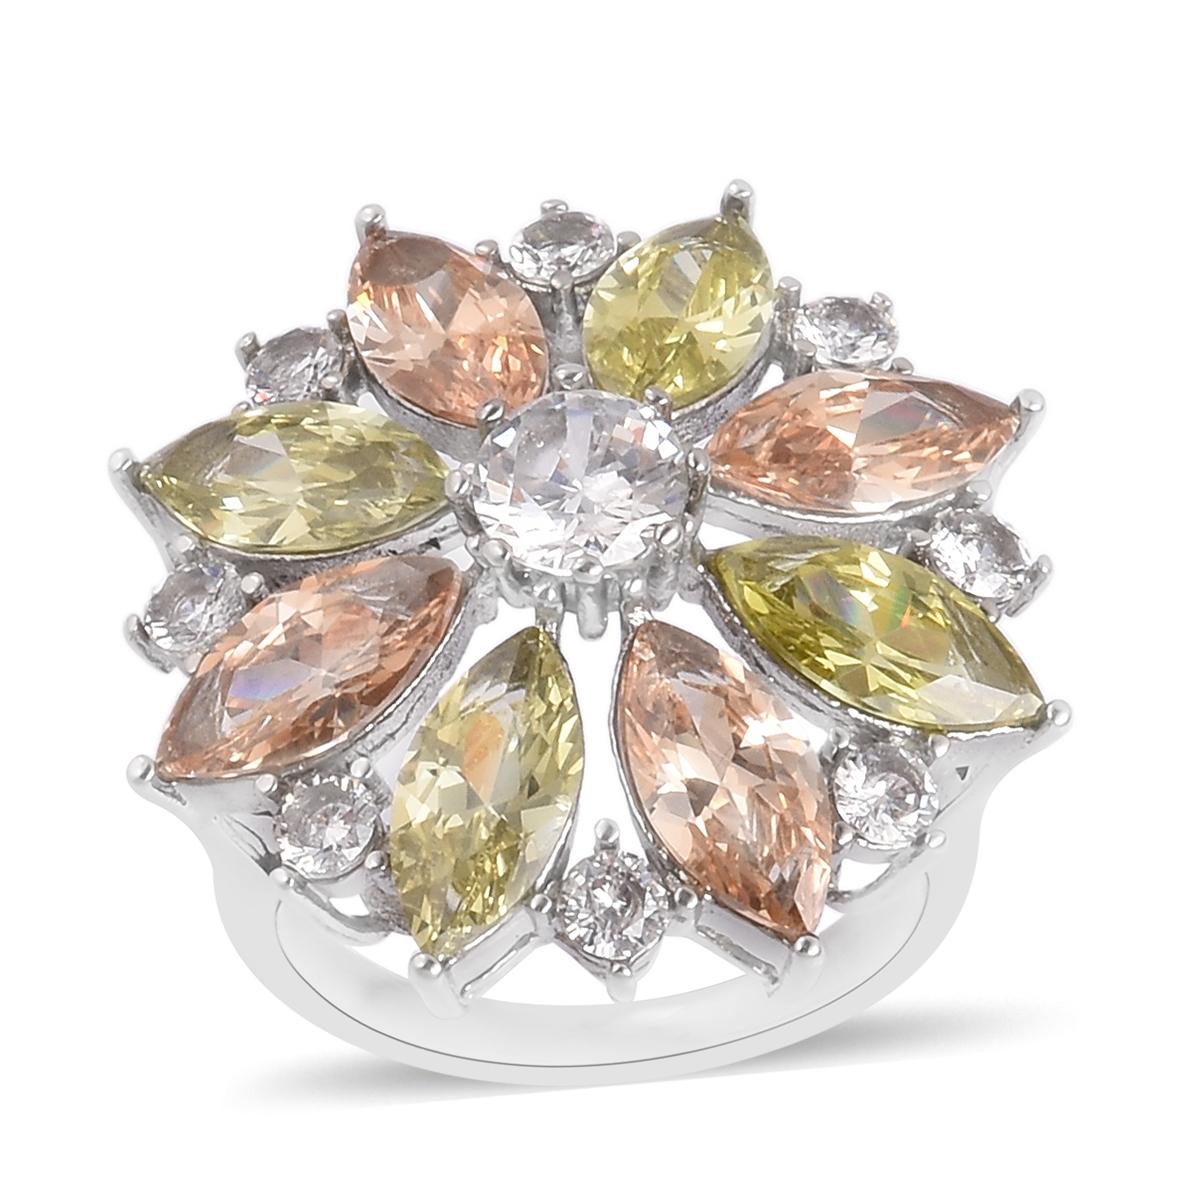 Simulated multi gemstone stainless steel daisy flower ring size 60 simulated multi gemstone stainless steel daisy flower ring size 60 tgw 390 cts 3025030 izmirmasajfo